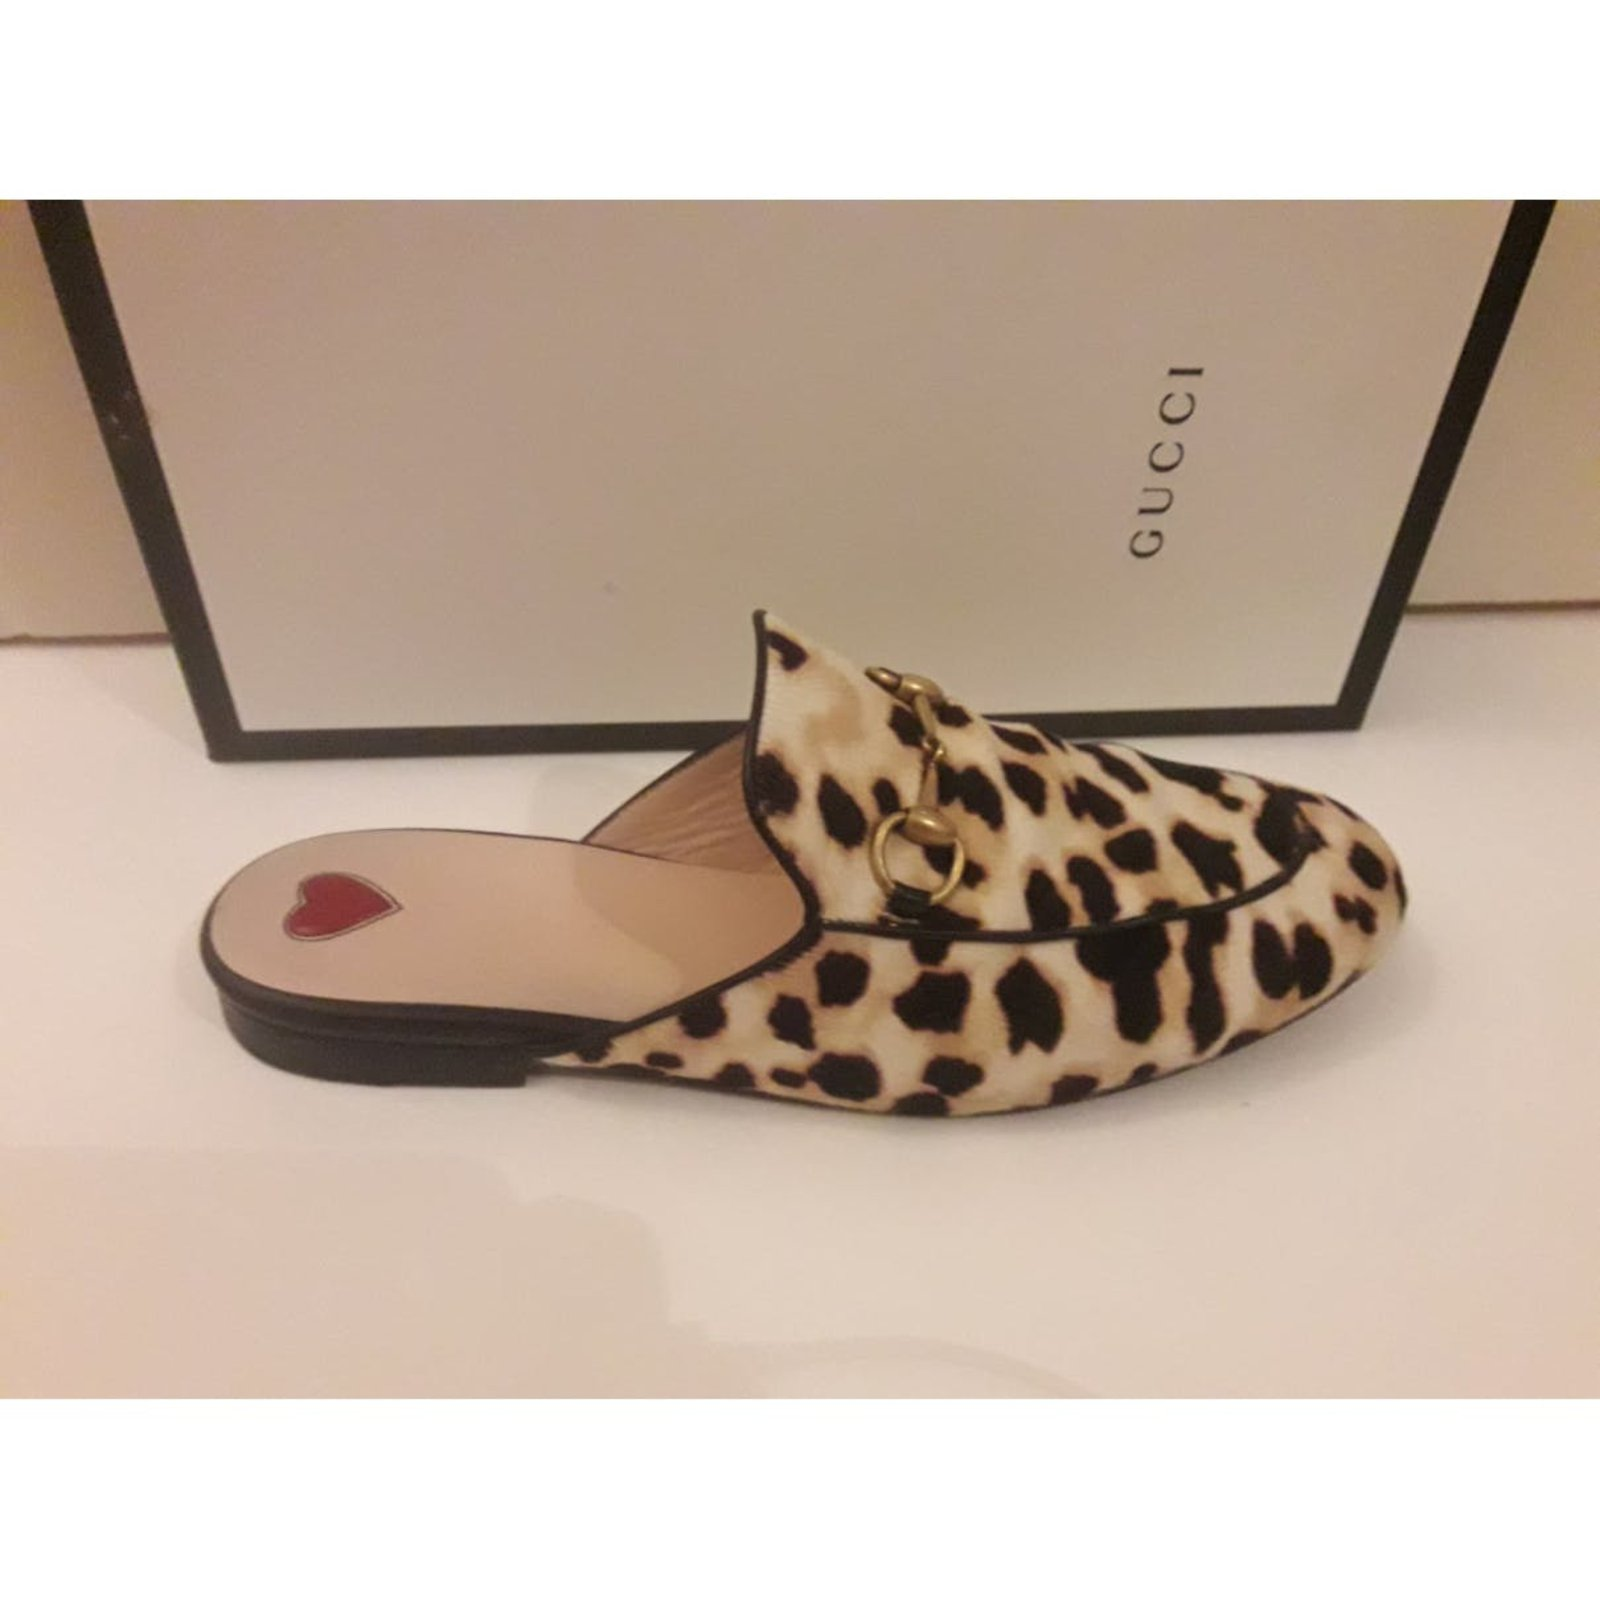 d7667edabfb6 Gucci Princetown leopard print Mules Pony-style calfskin Multiple colors  ref.87586 - Joli Closet